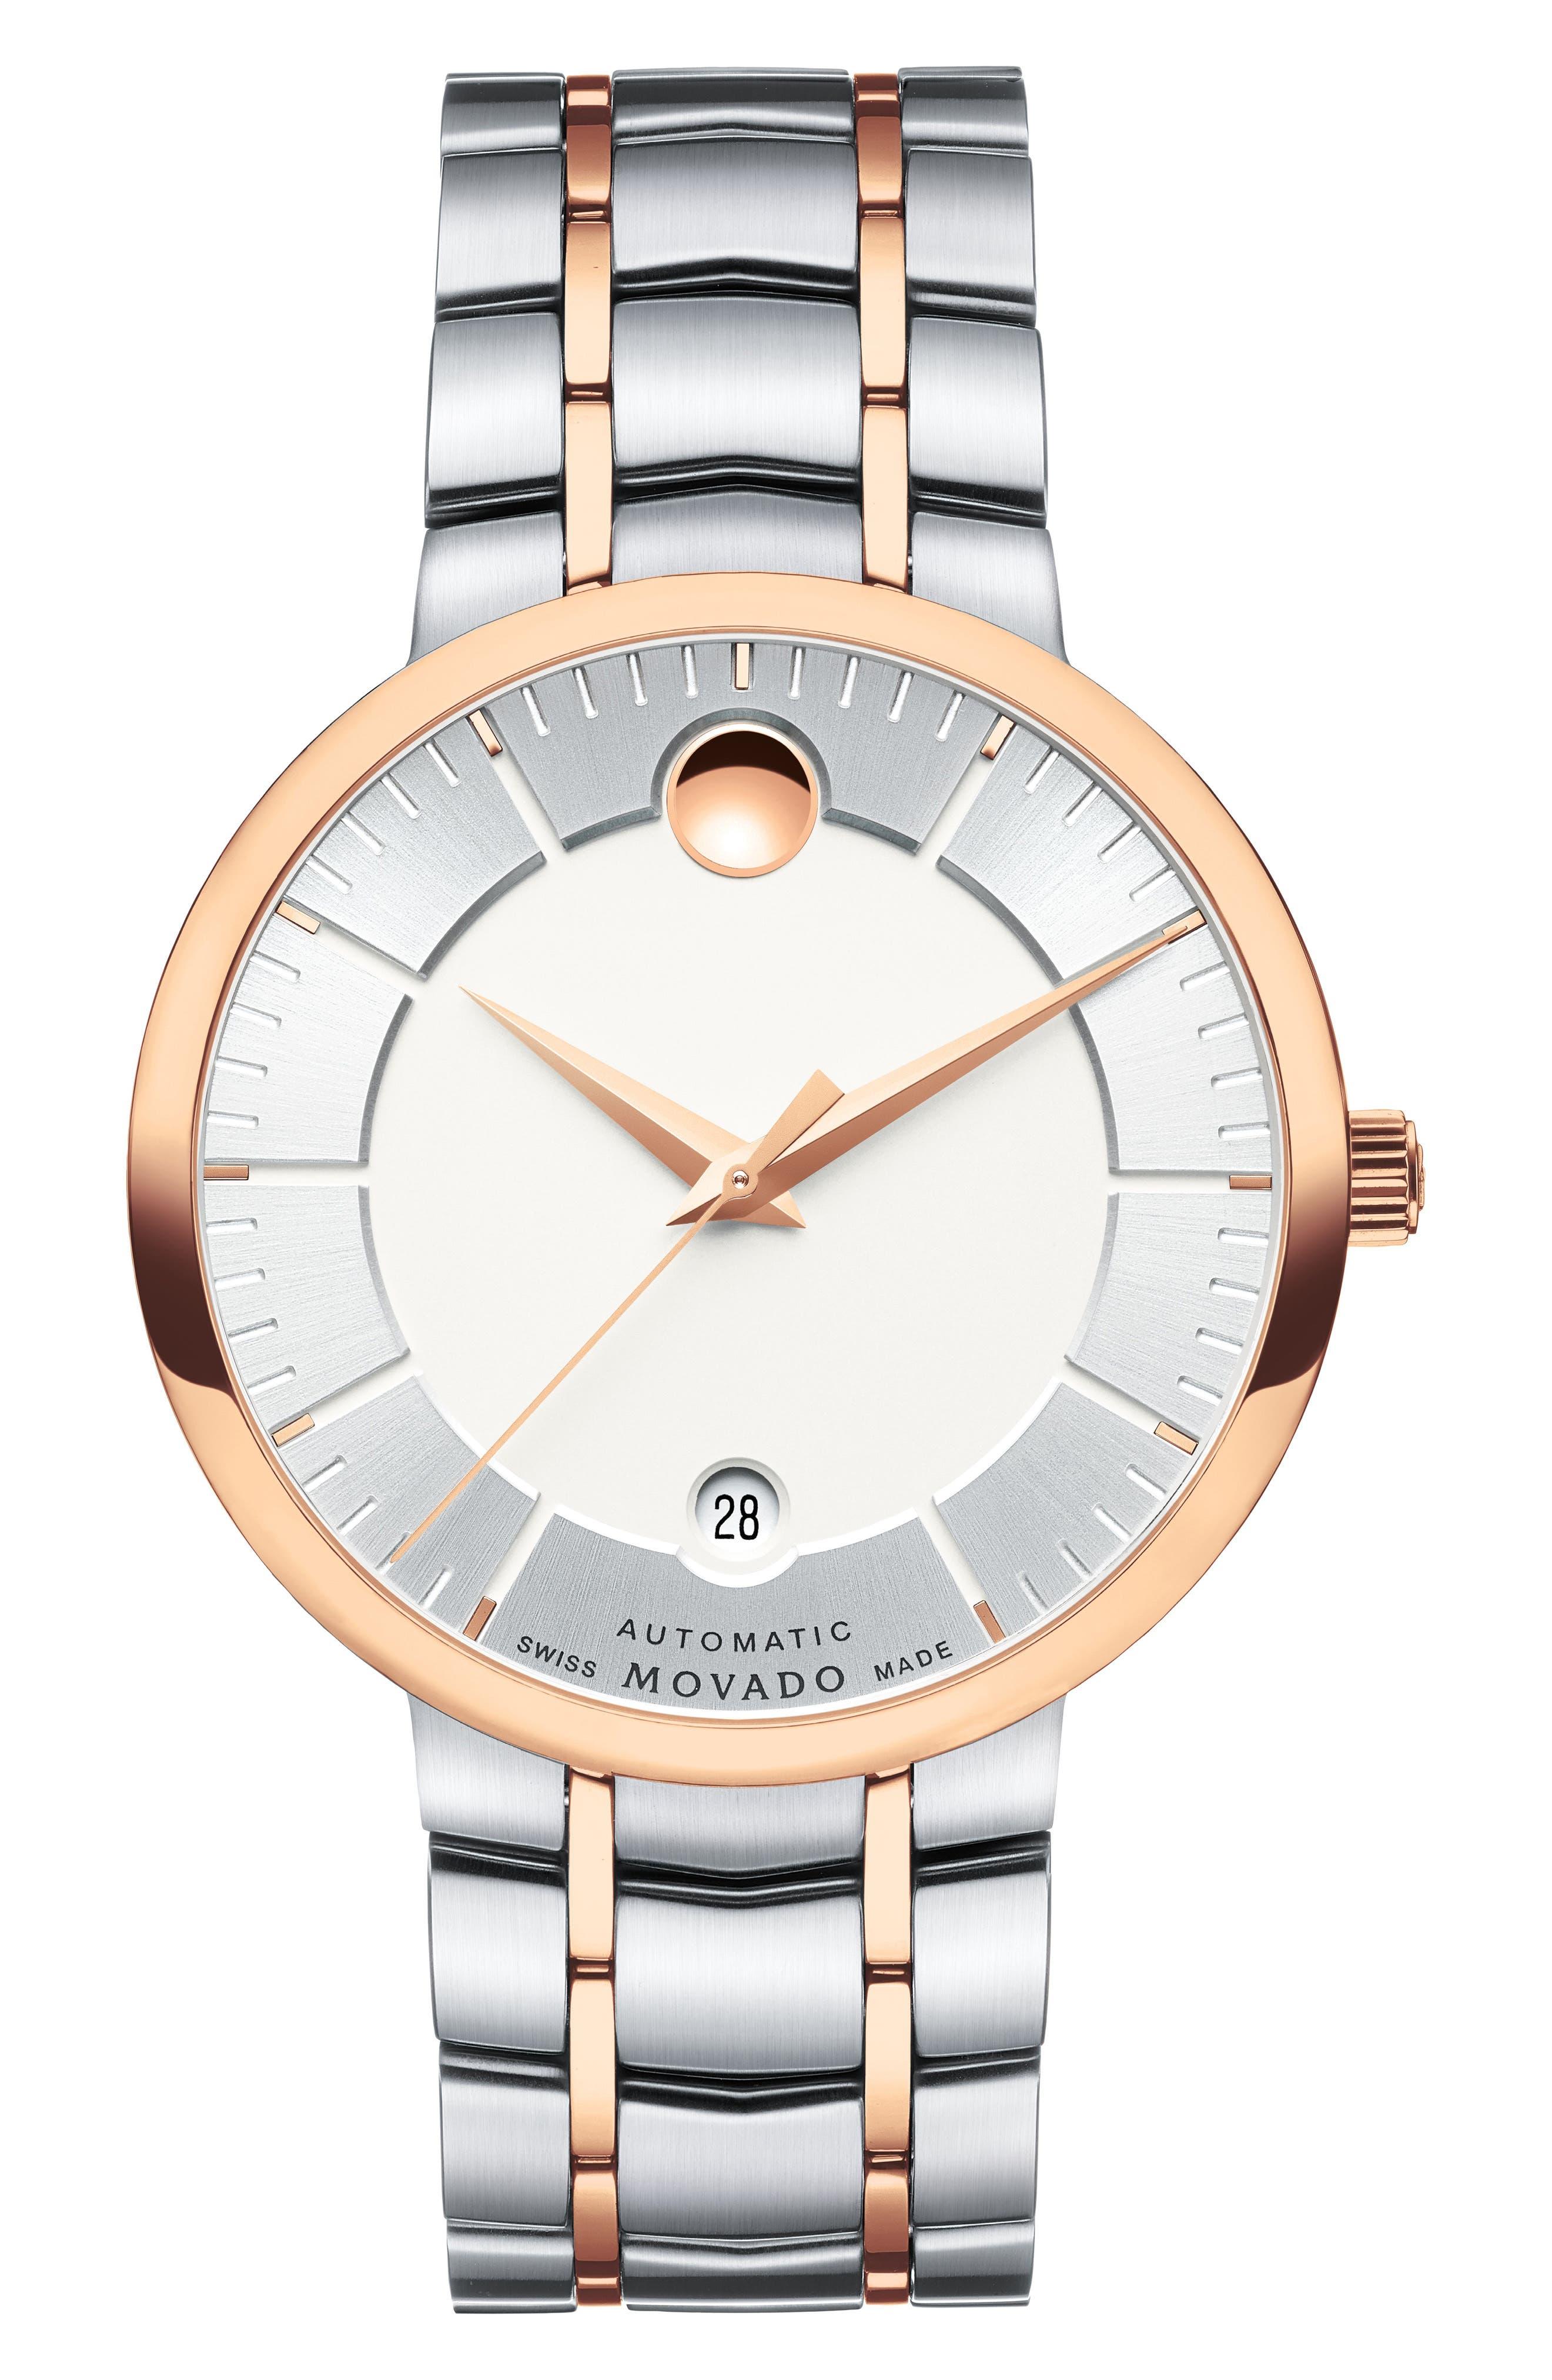 Alternate Image 1 Selected - Movado 1881 Automatic Bracelet Watch, 40mm